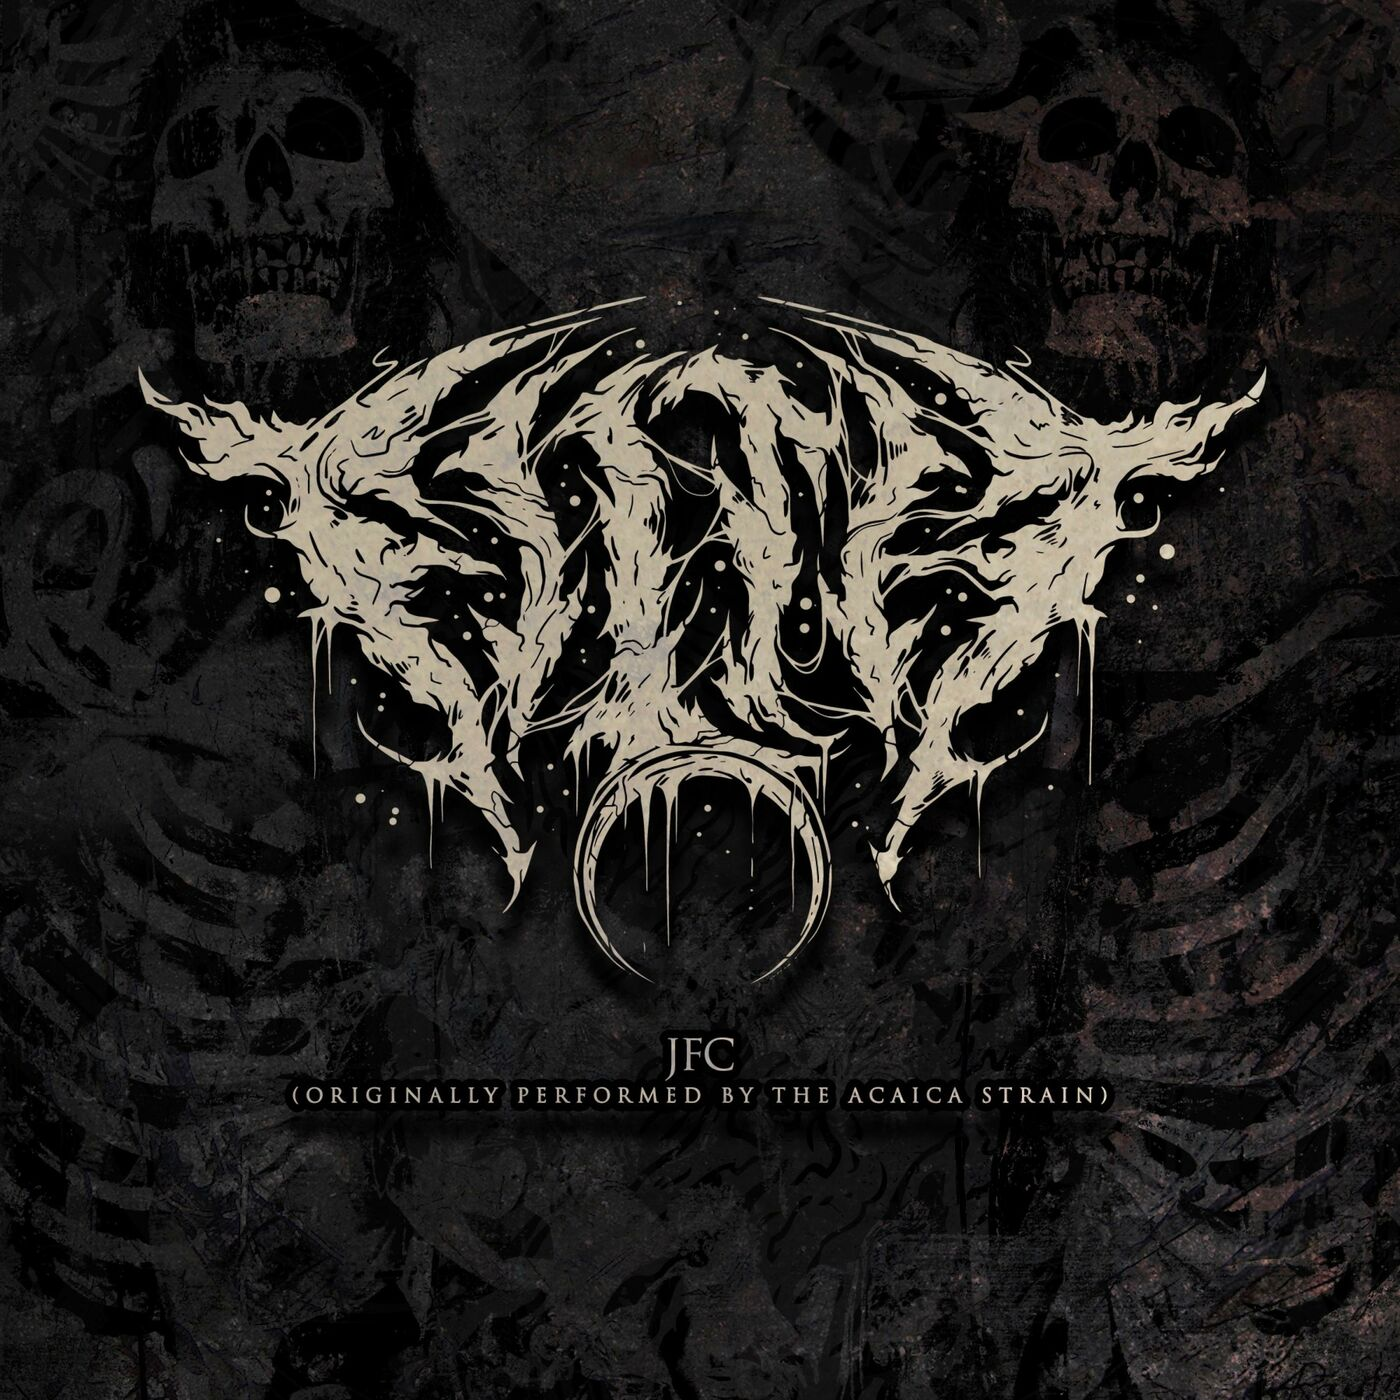 Filth - JFC (The Acacia Strain Cover) [single] (2020)